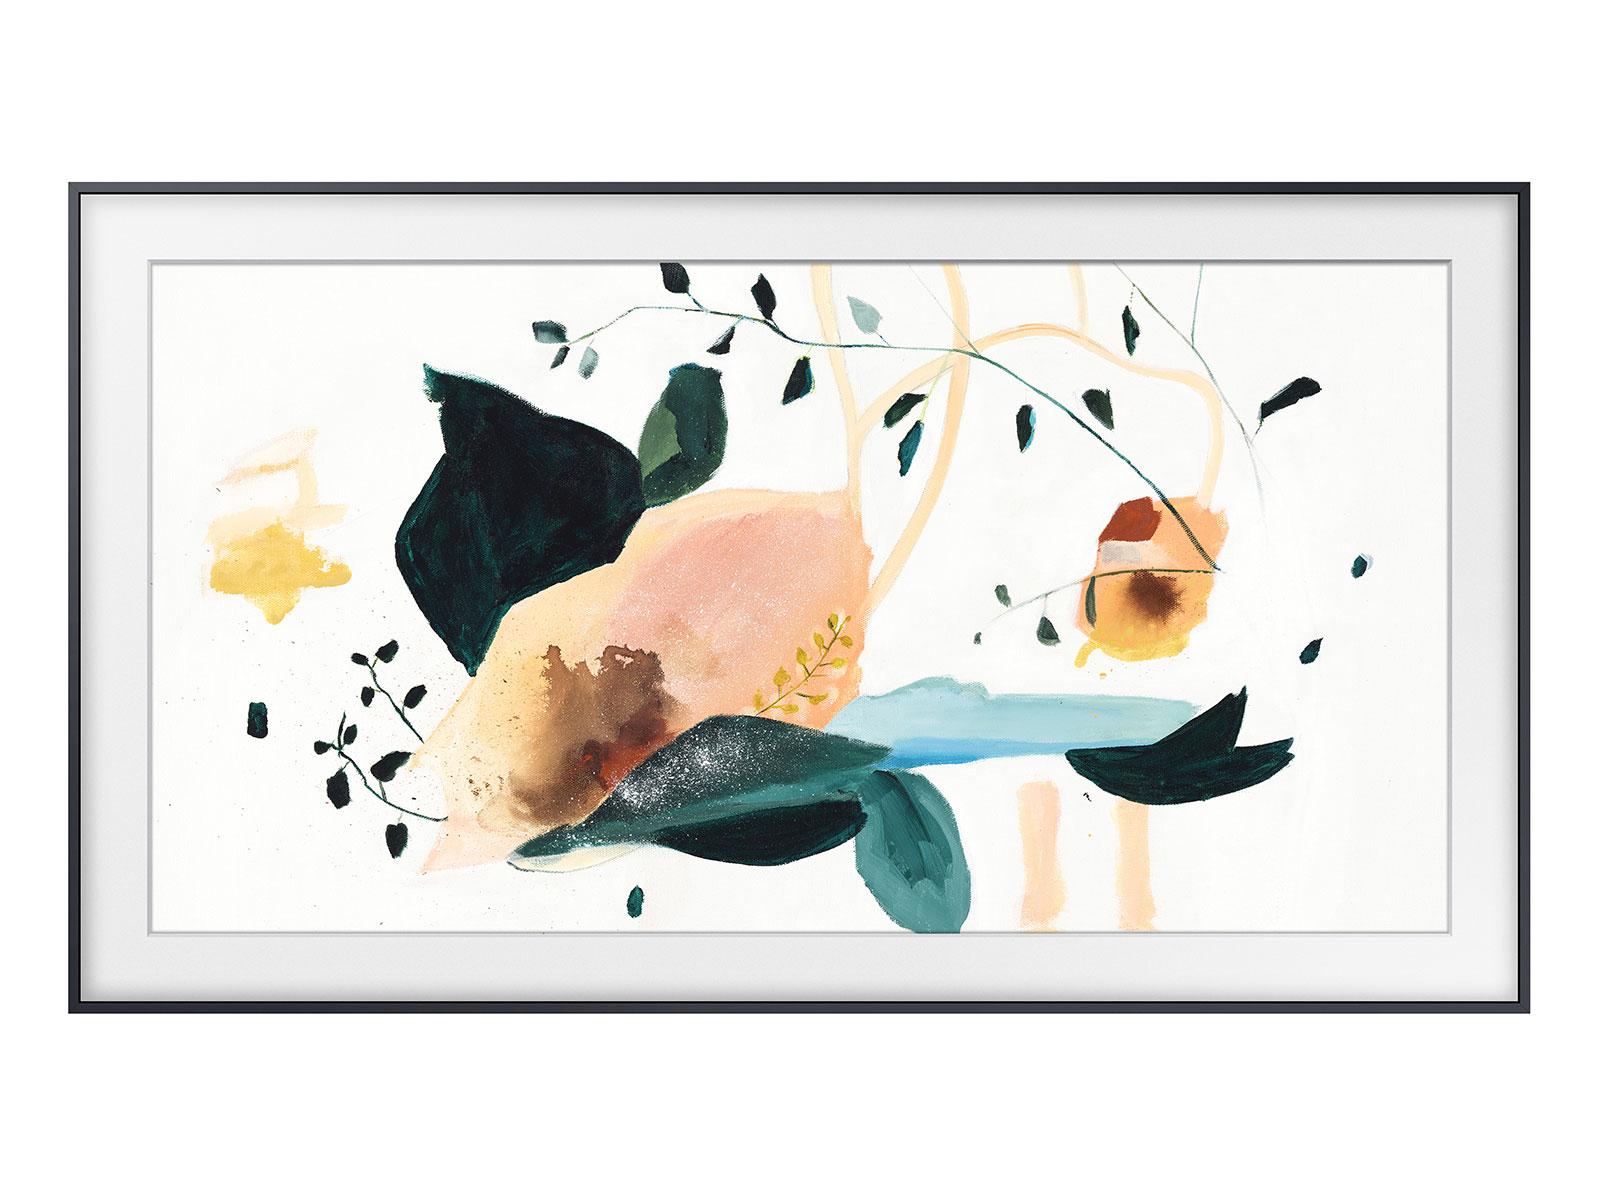 Samsung 75inches Frame TV 2020 model $1899.97 at Costco B&M YMMV